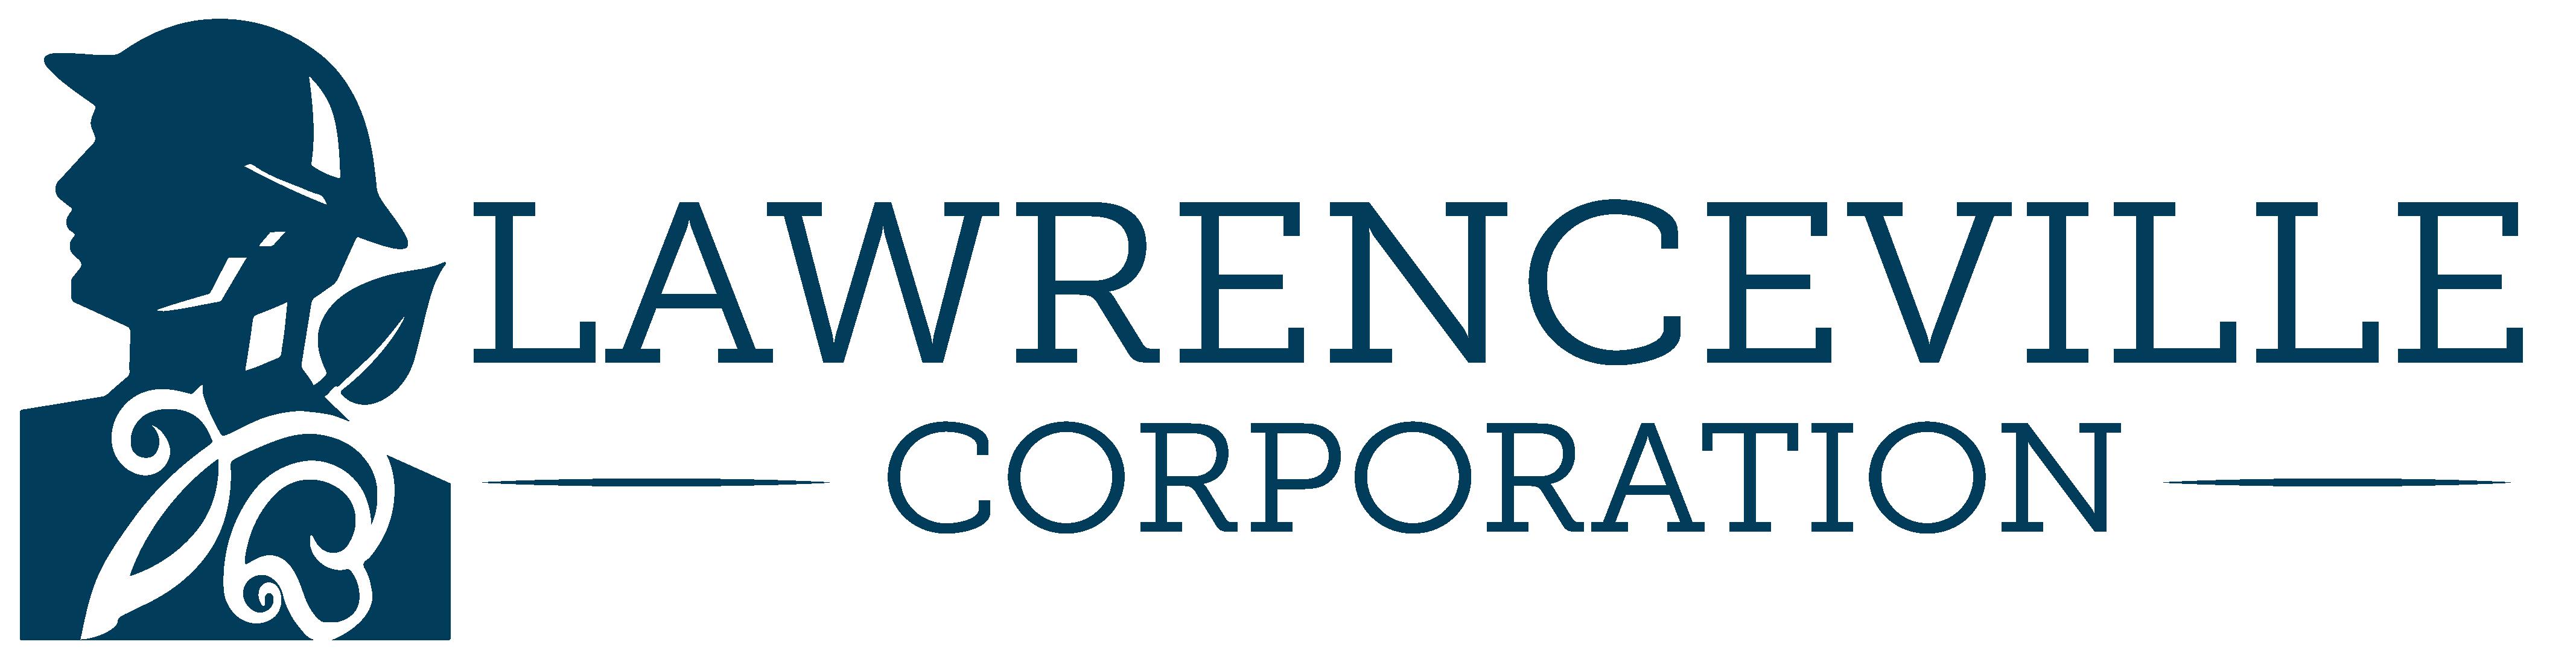 Lawrenceville Corporation